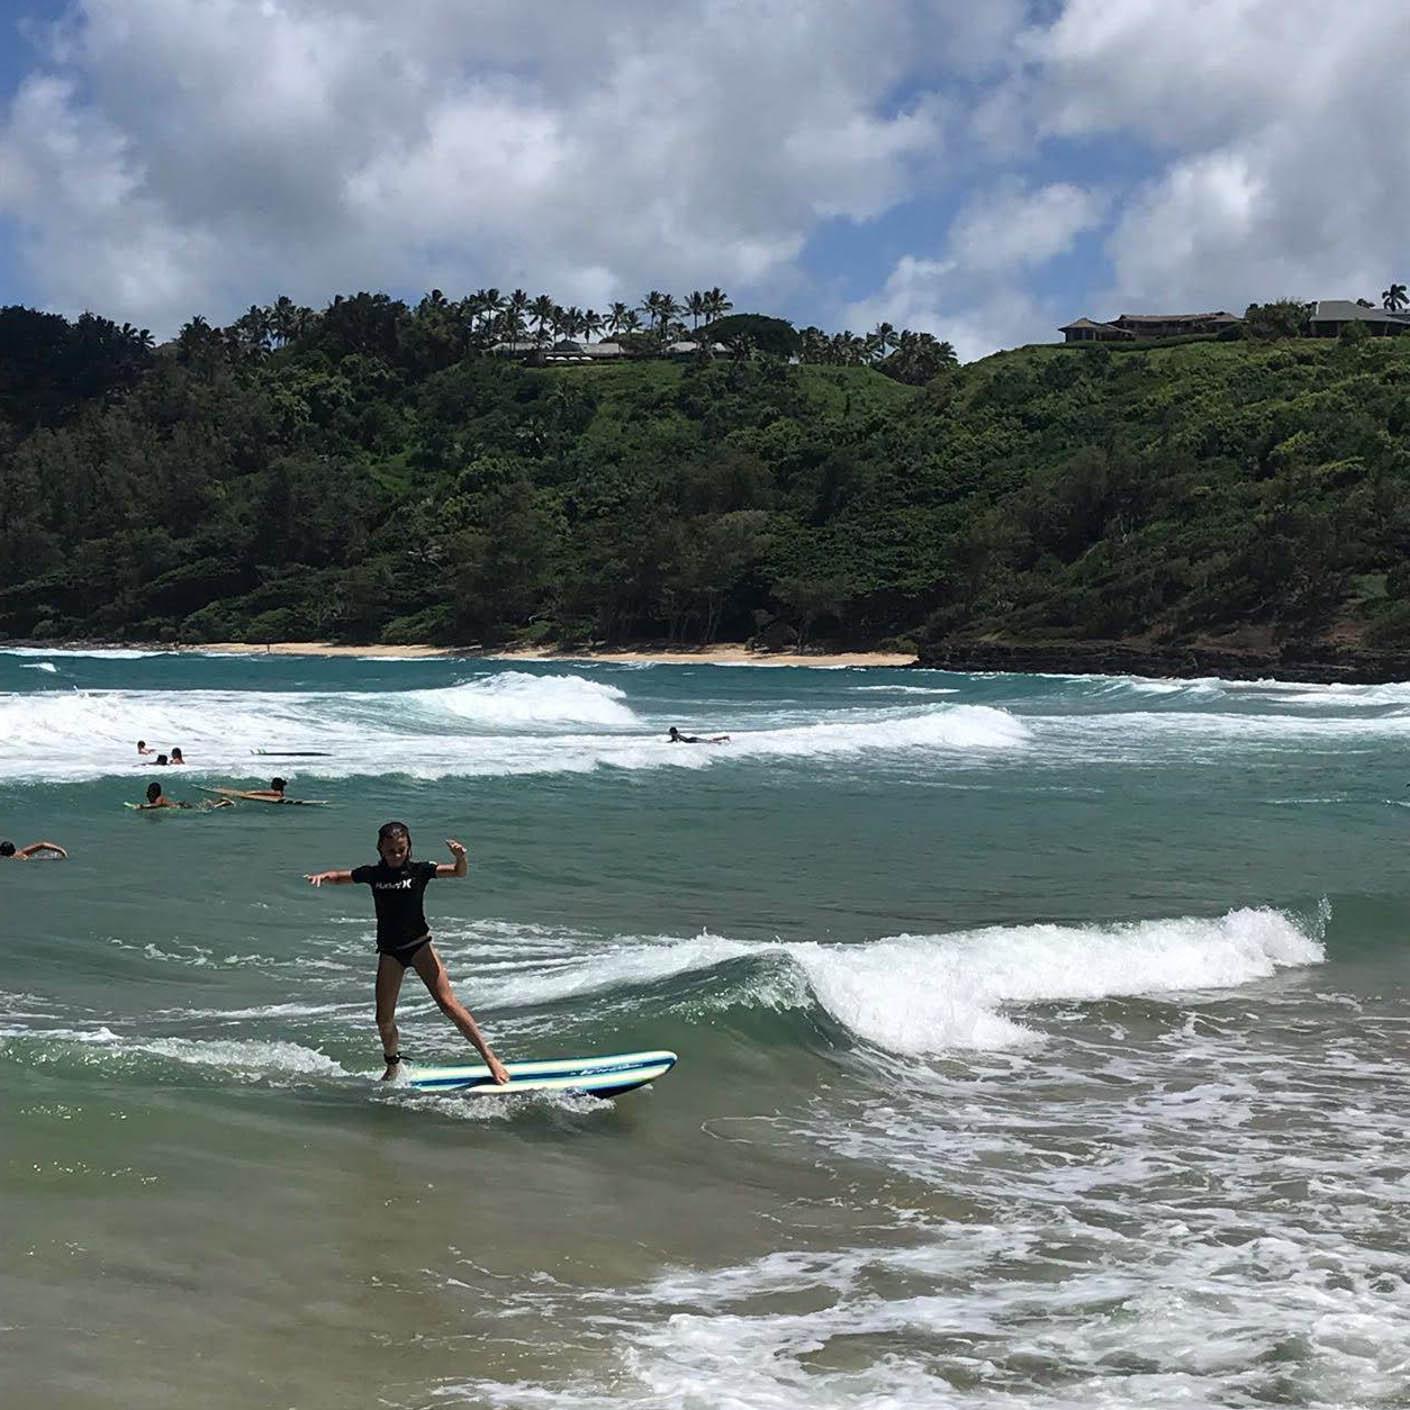 Hawaii Explorer surfing